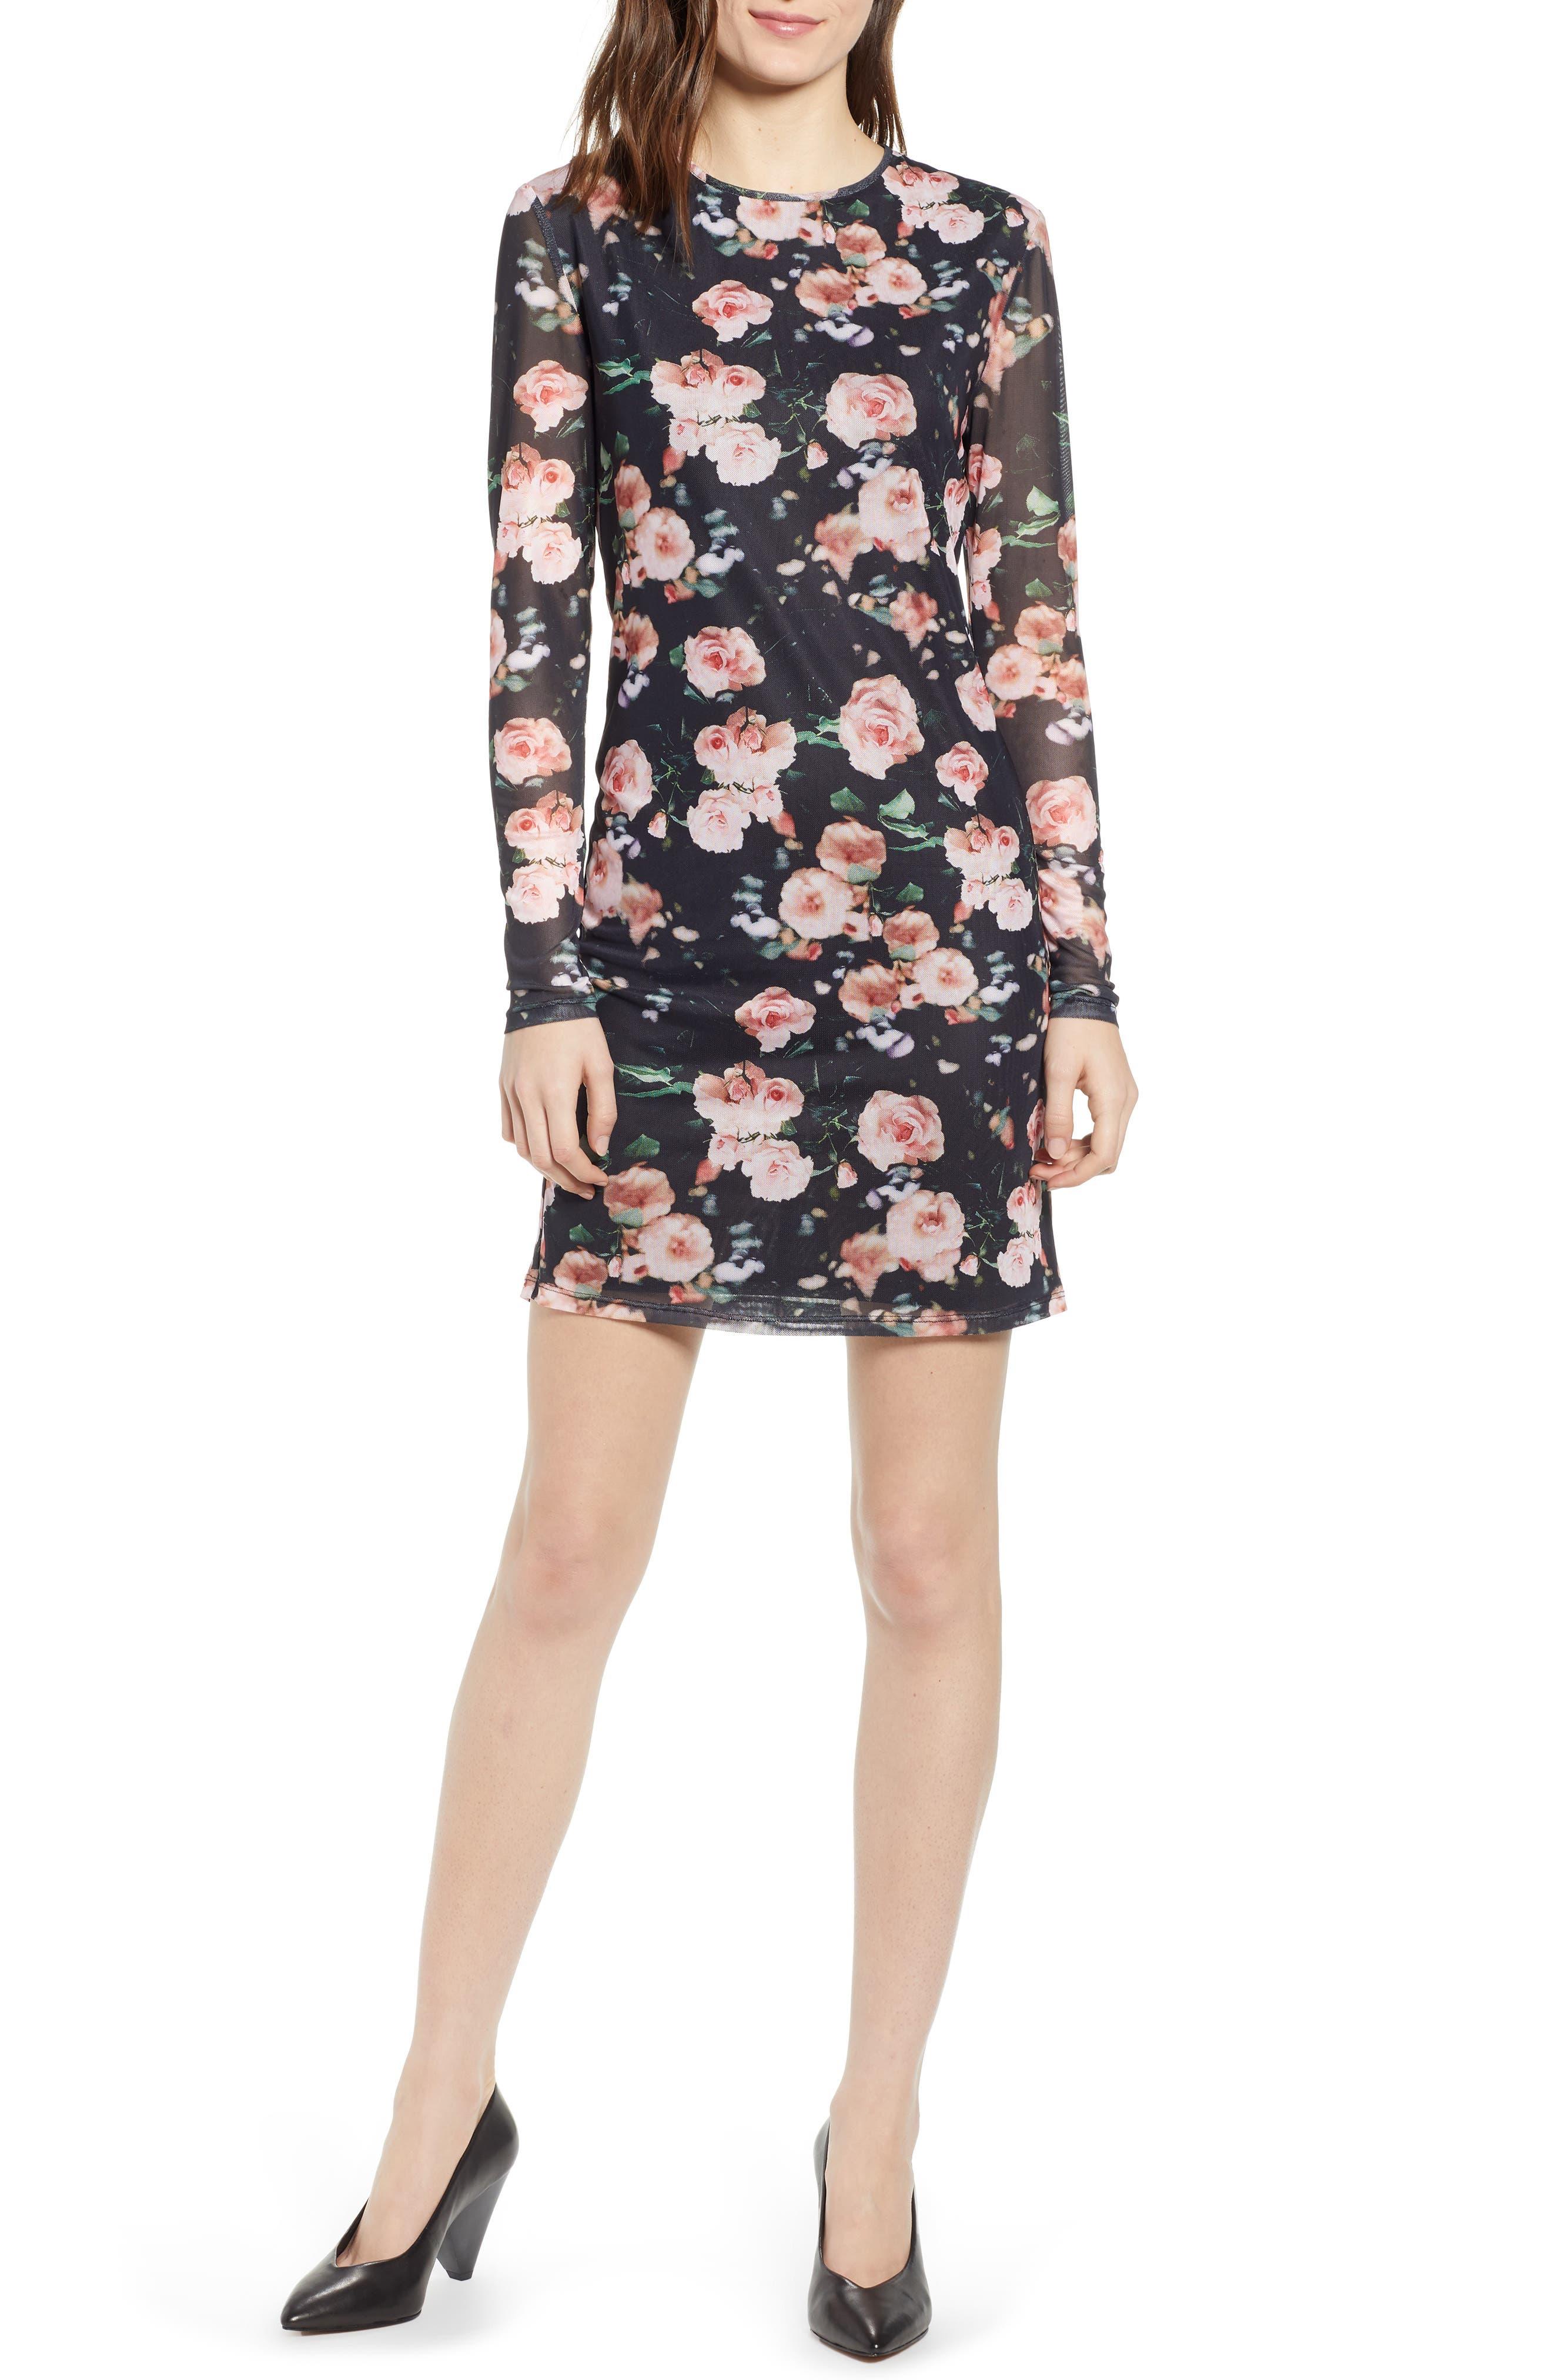 Rebecca Minkoff Phoebe Long Sleeve Sheath Dress, Black